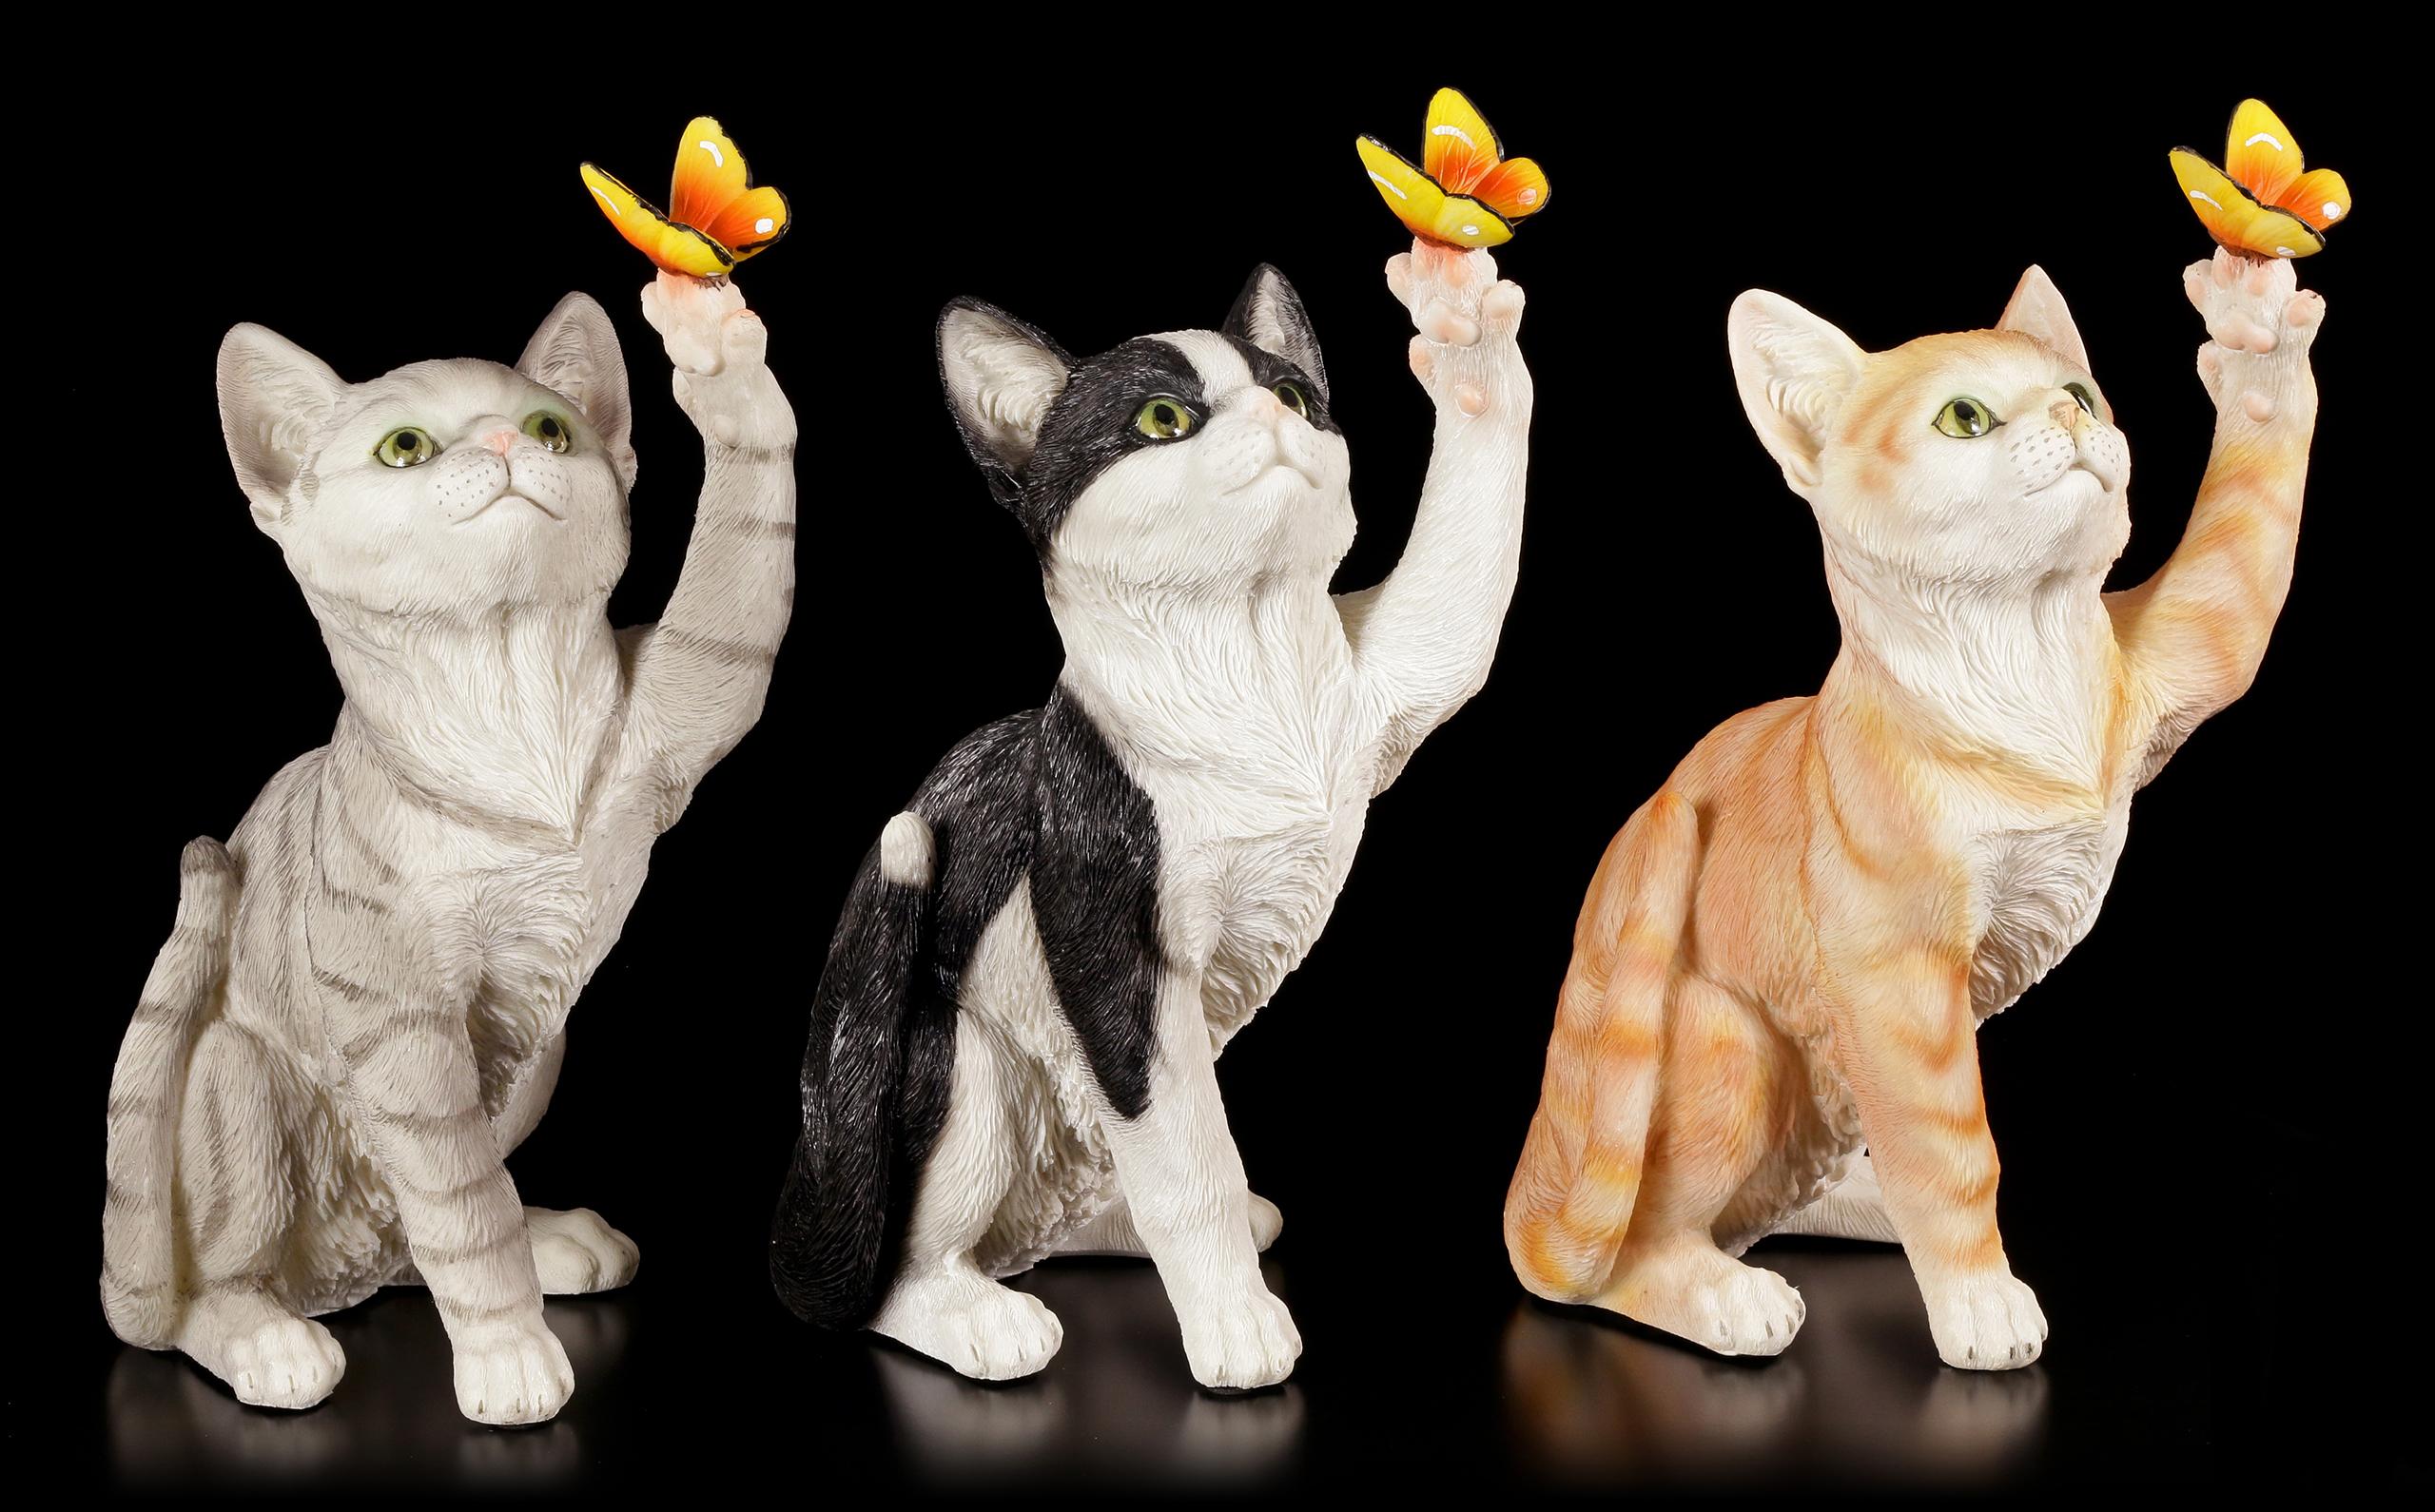 katzenfiguren figur katze online kaufen. Black Bedroom Furniture Sets. Home Design Ideas